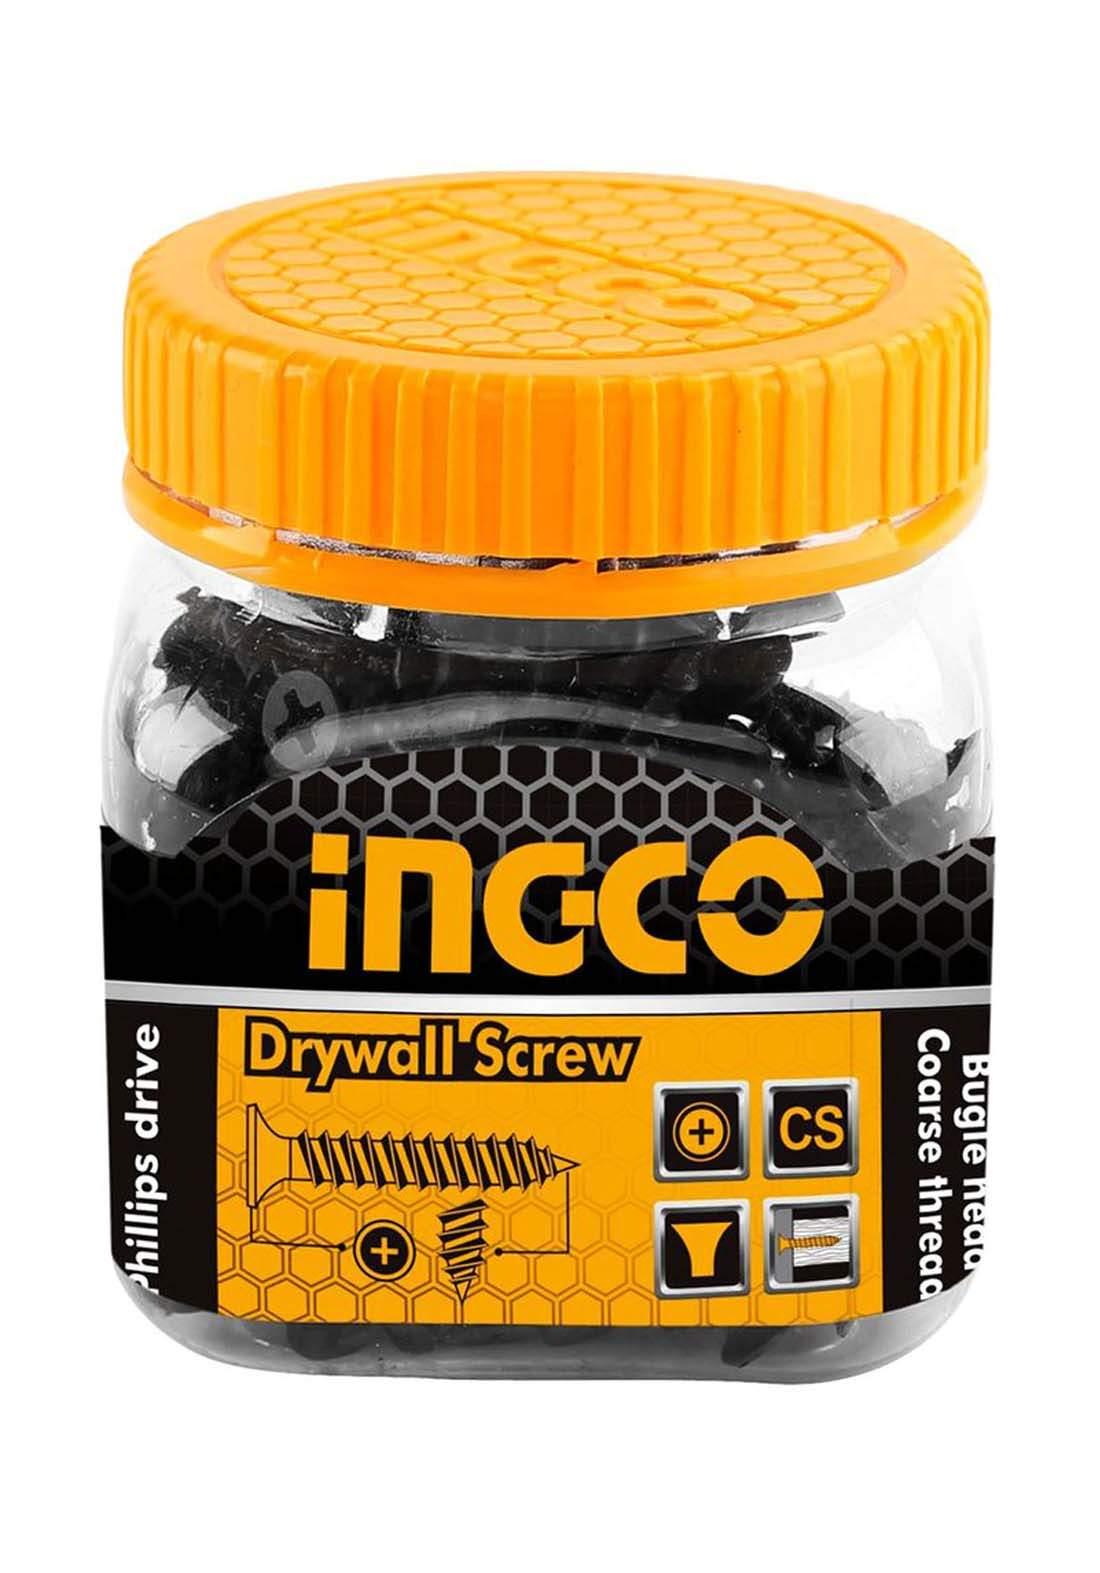 Ingco HWDS4206321 Drywall screw ST4.2 * 63 mm علبة براغي